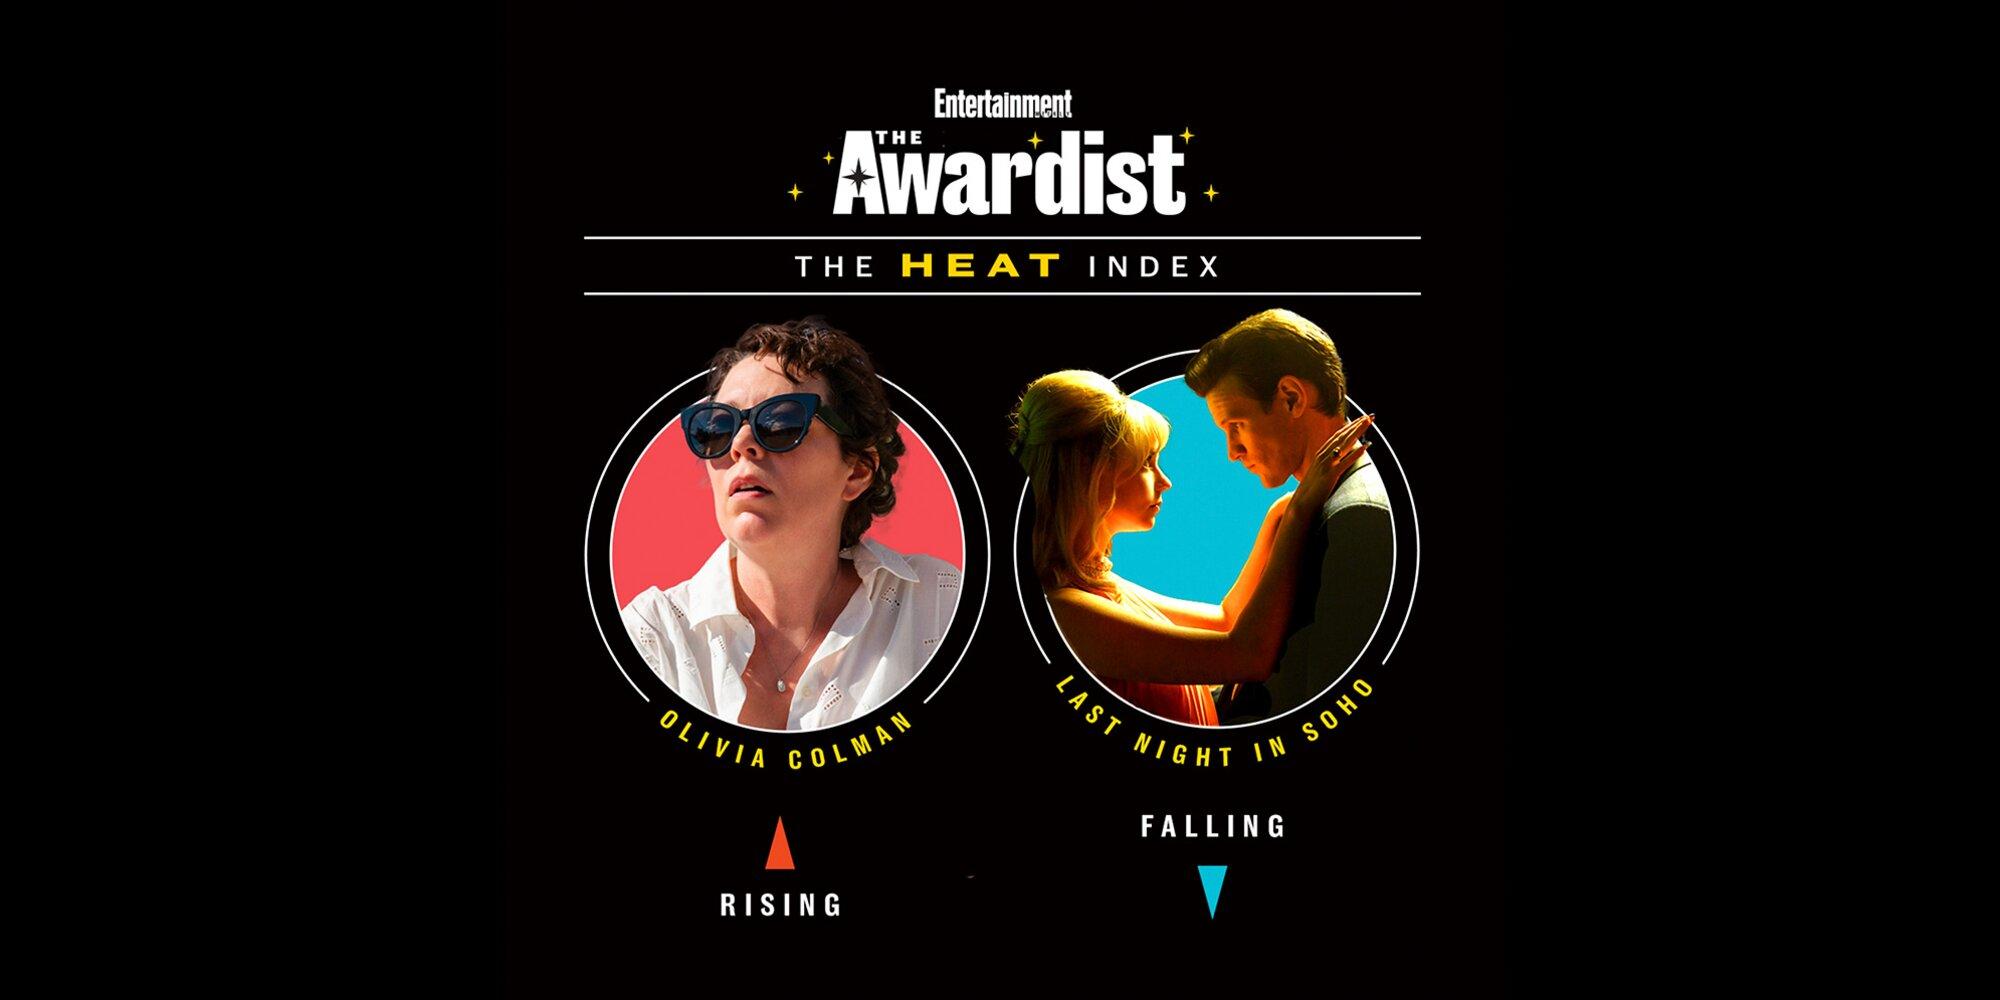 Oscars heat index: Olivia Colman closes Telluride with major awards buzz